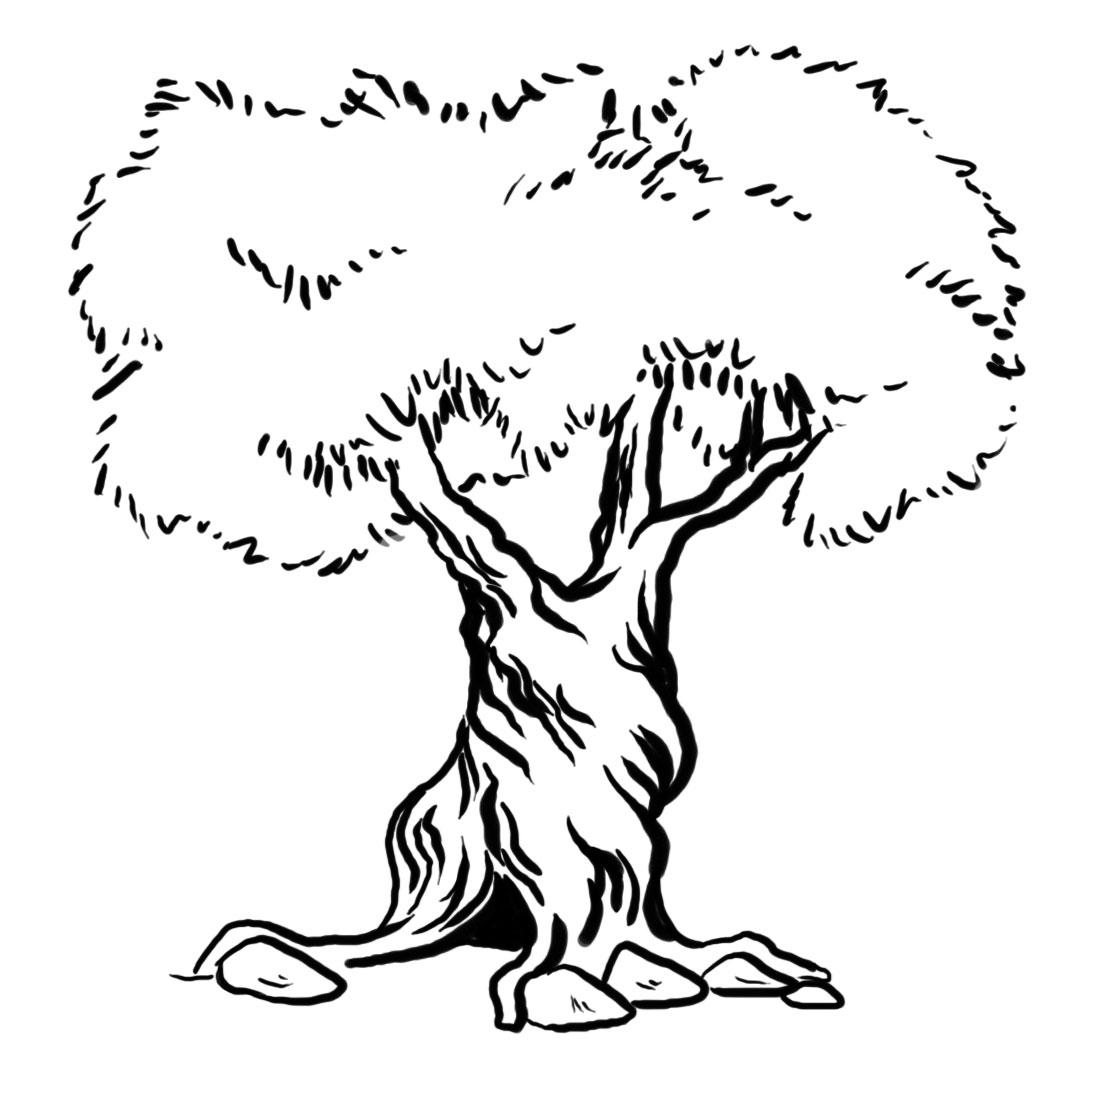 1100x1100 Drawn Branch Tree Line